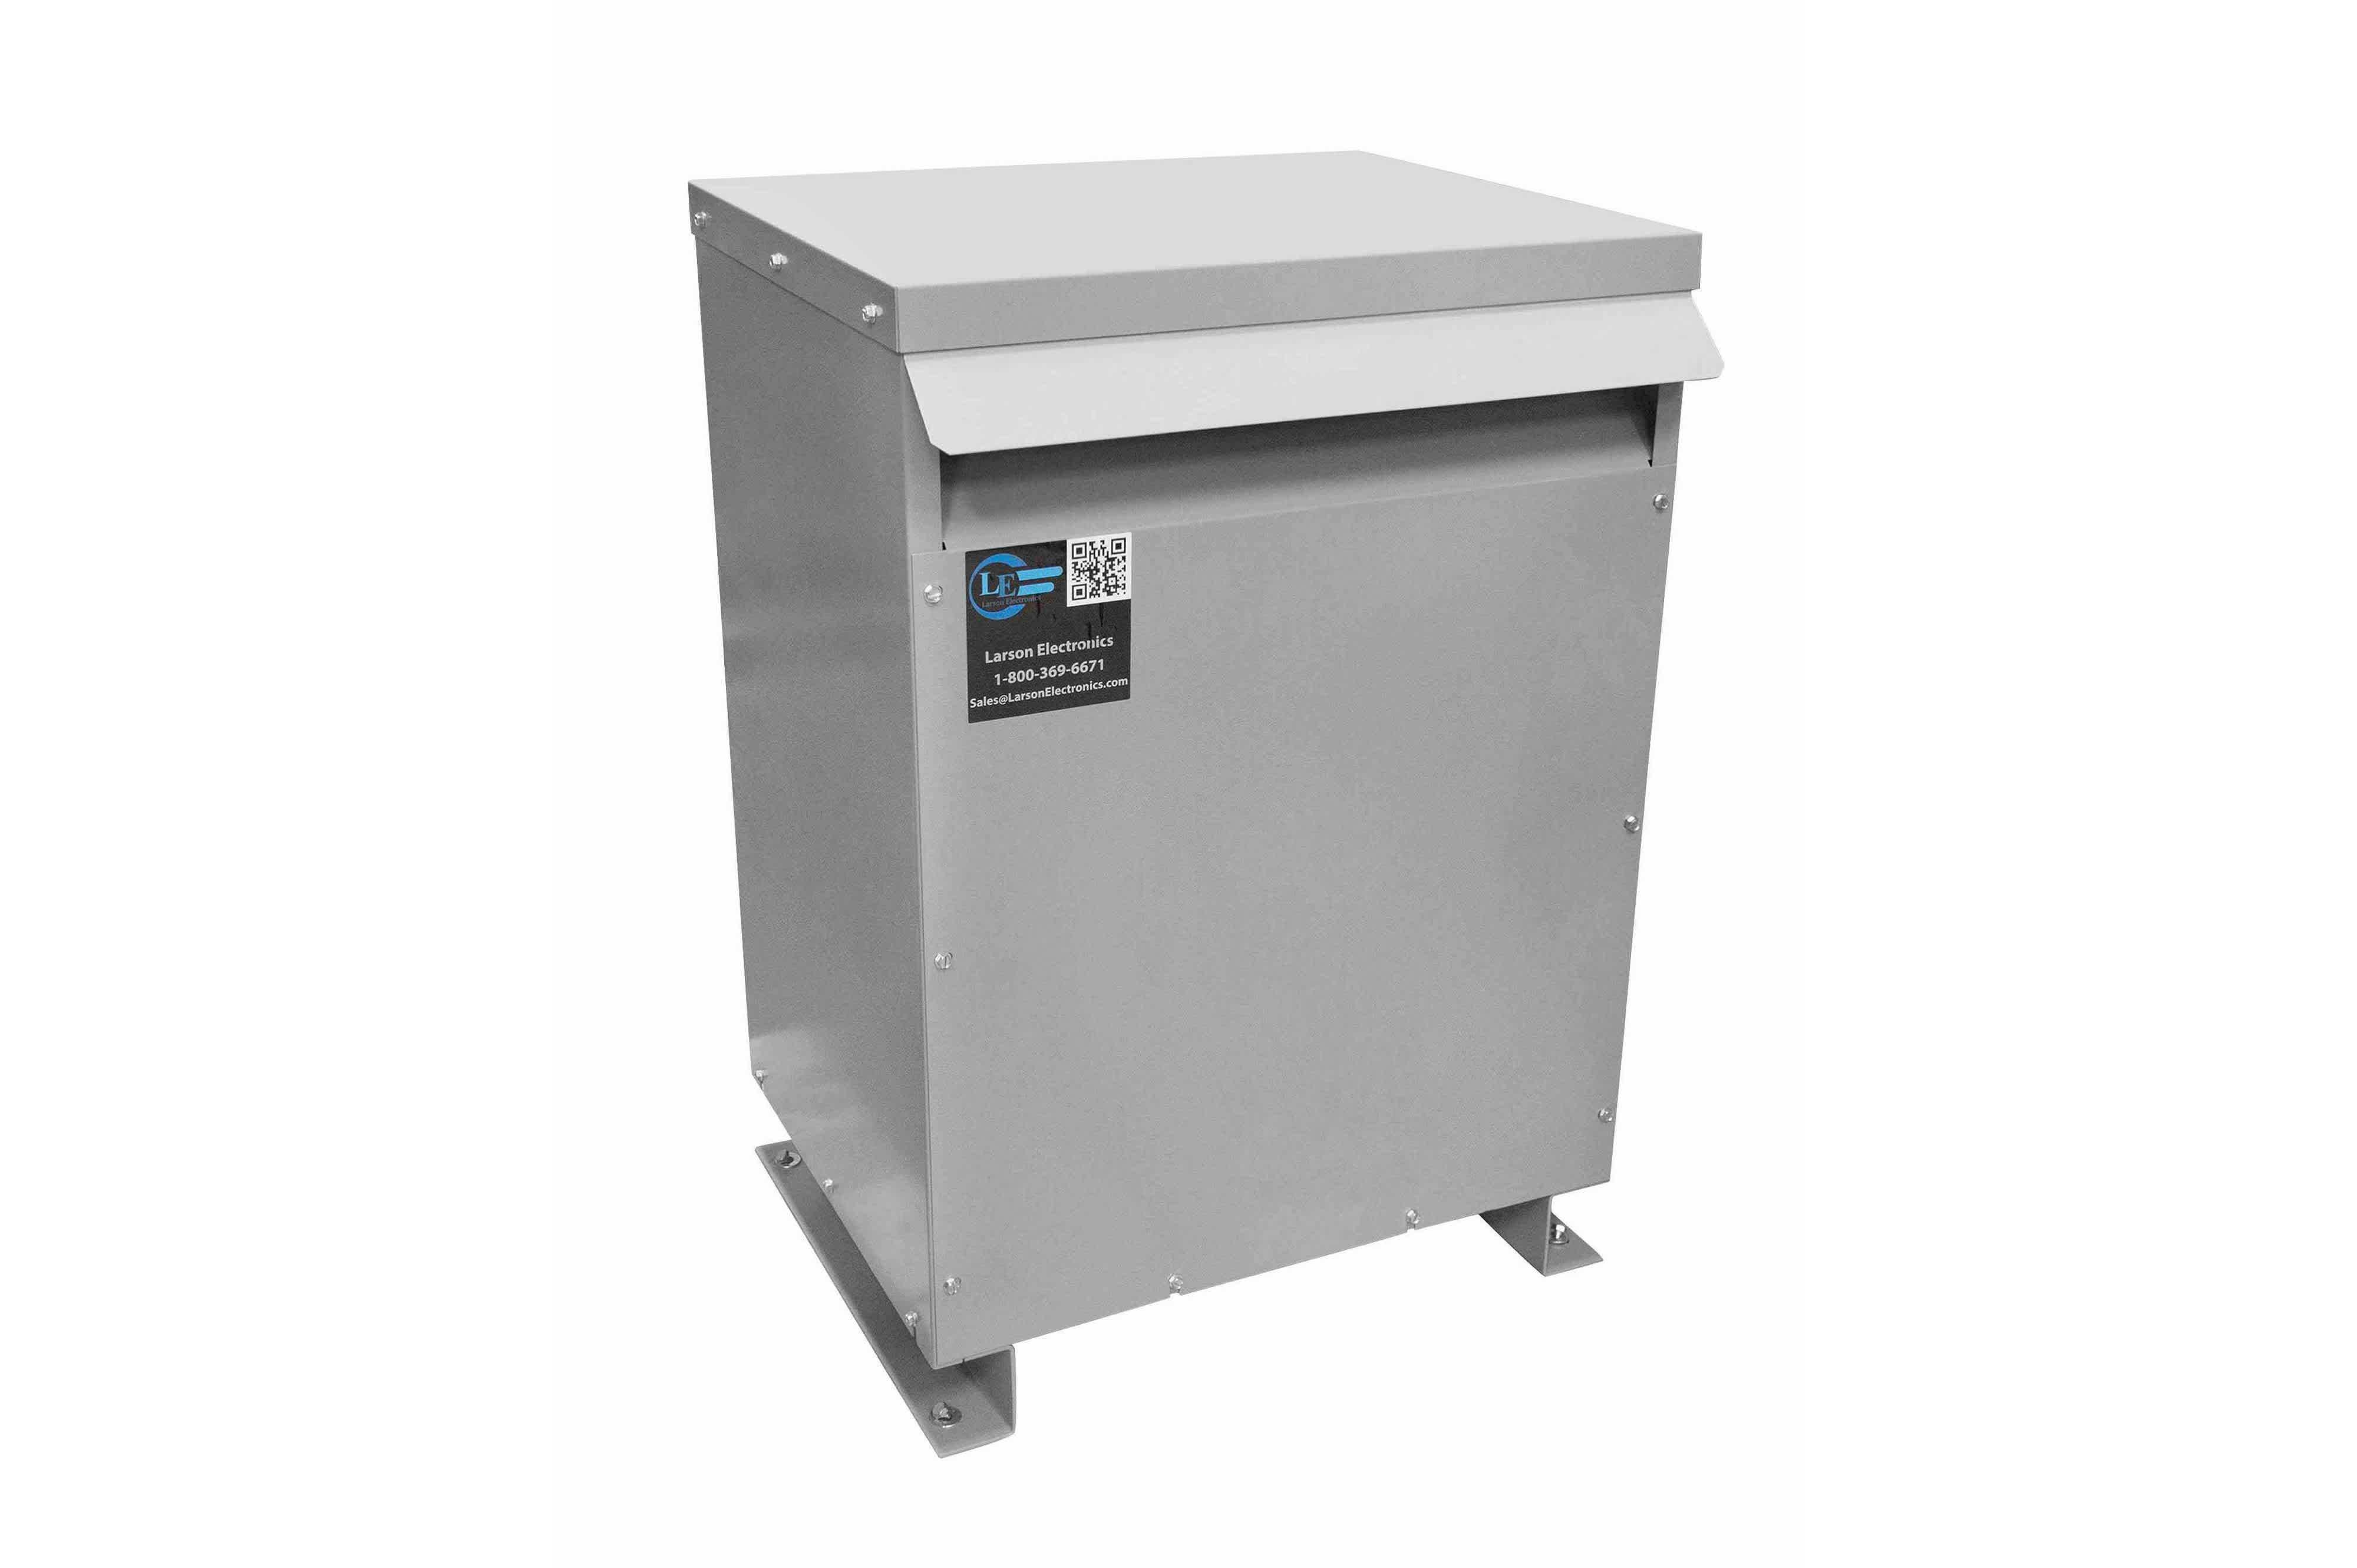 30 kVA 3PH Isolation Transformer, 480V Wye Primary, 480Y/277 Wye-N Secondary, N3R, Ventilated, 60 Hz